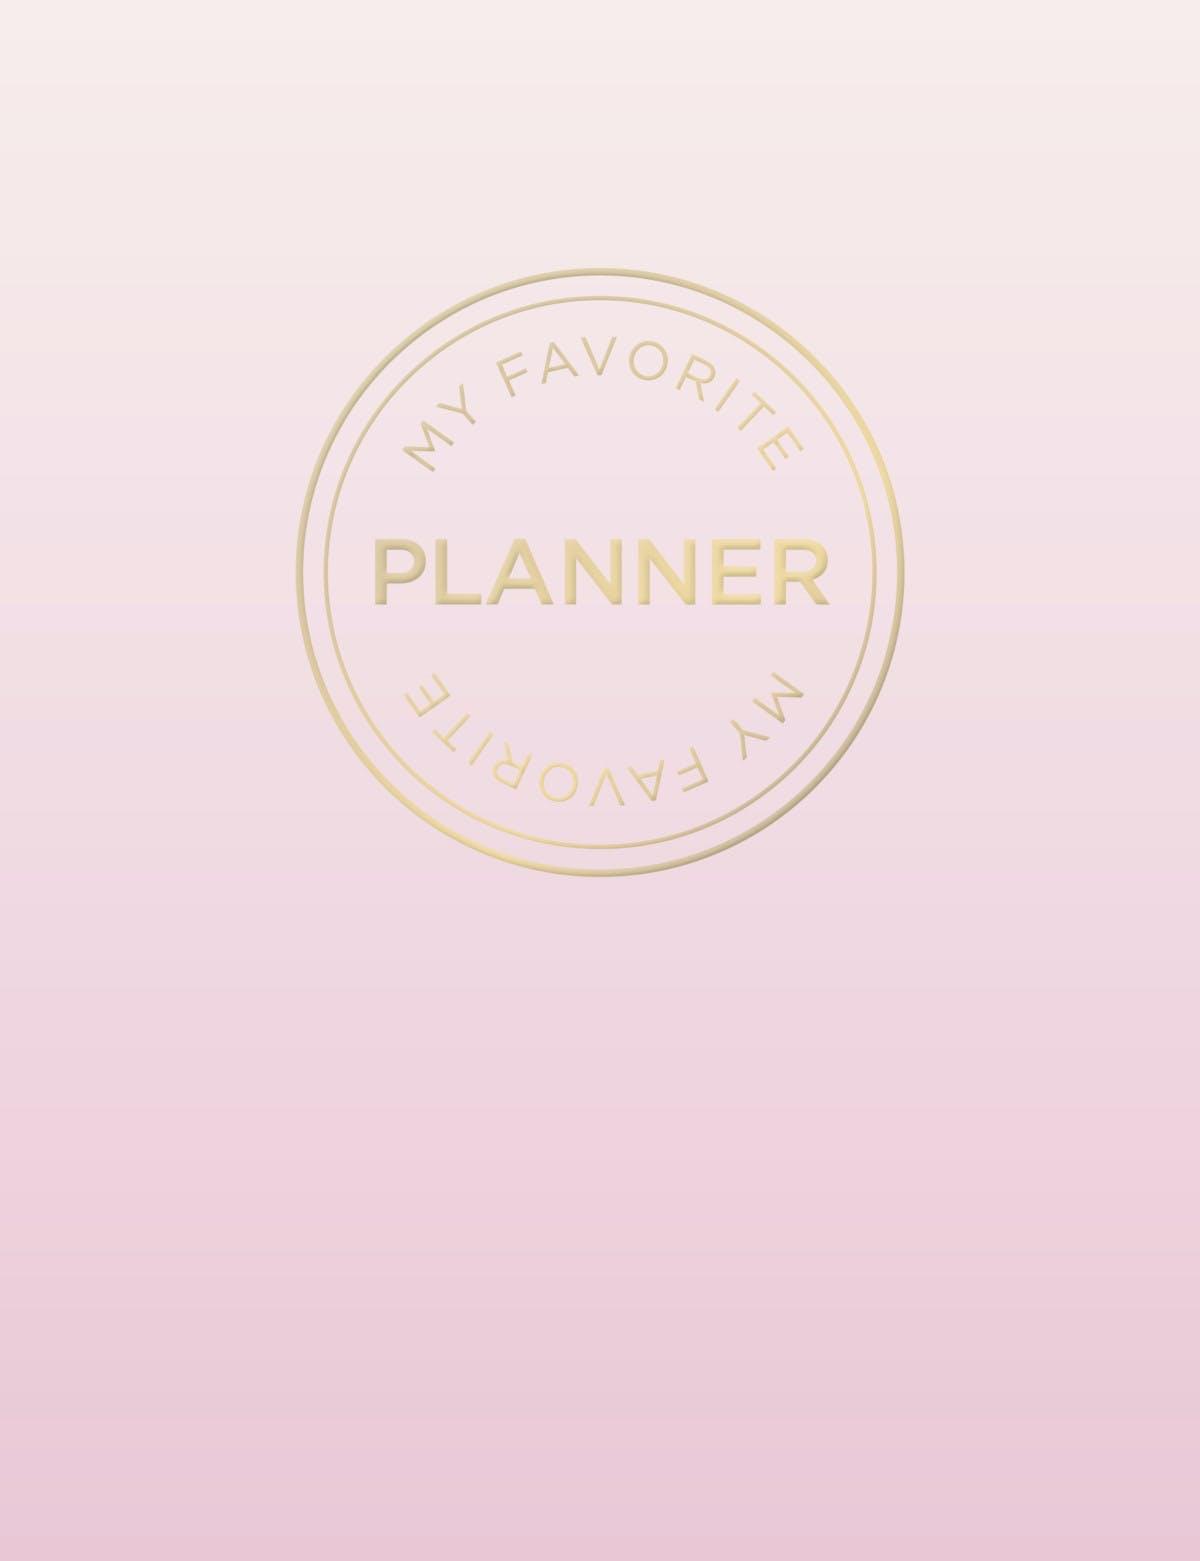 My Favorite Planner